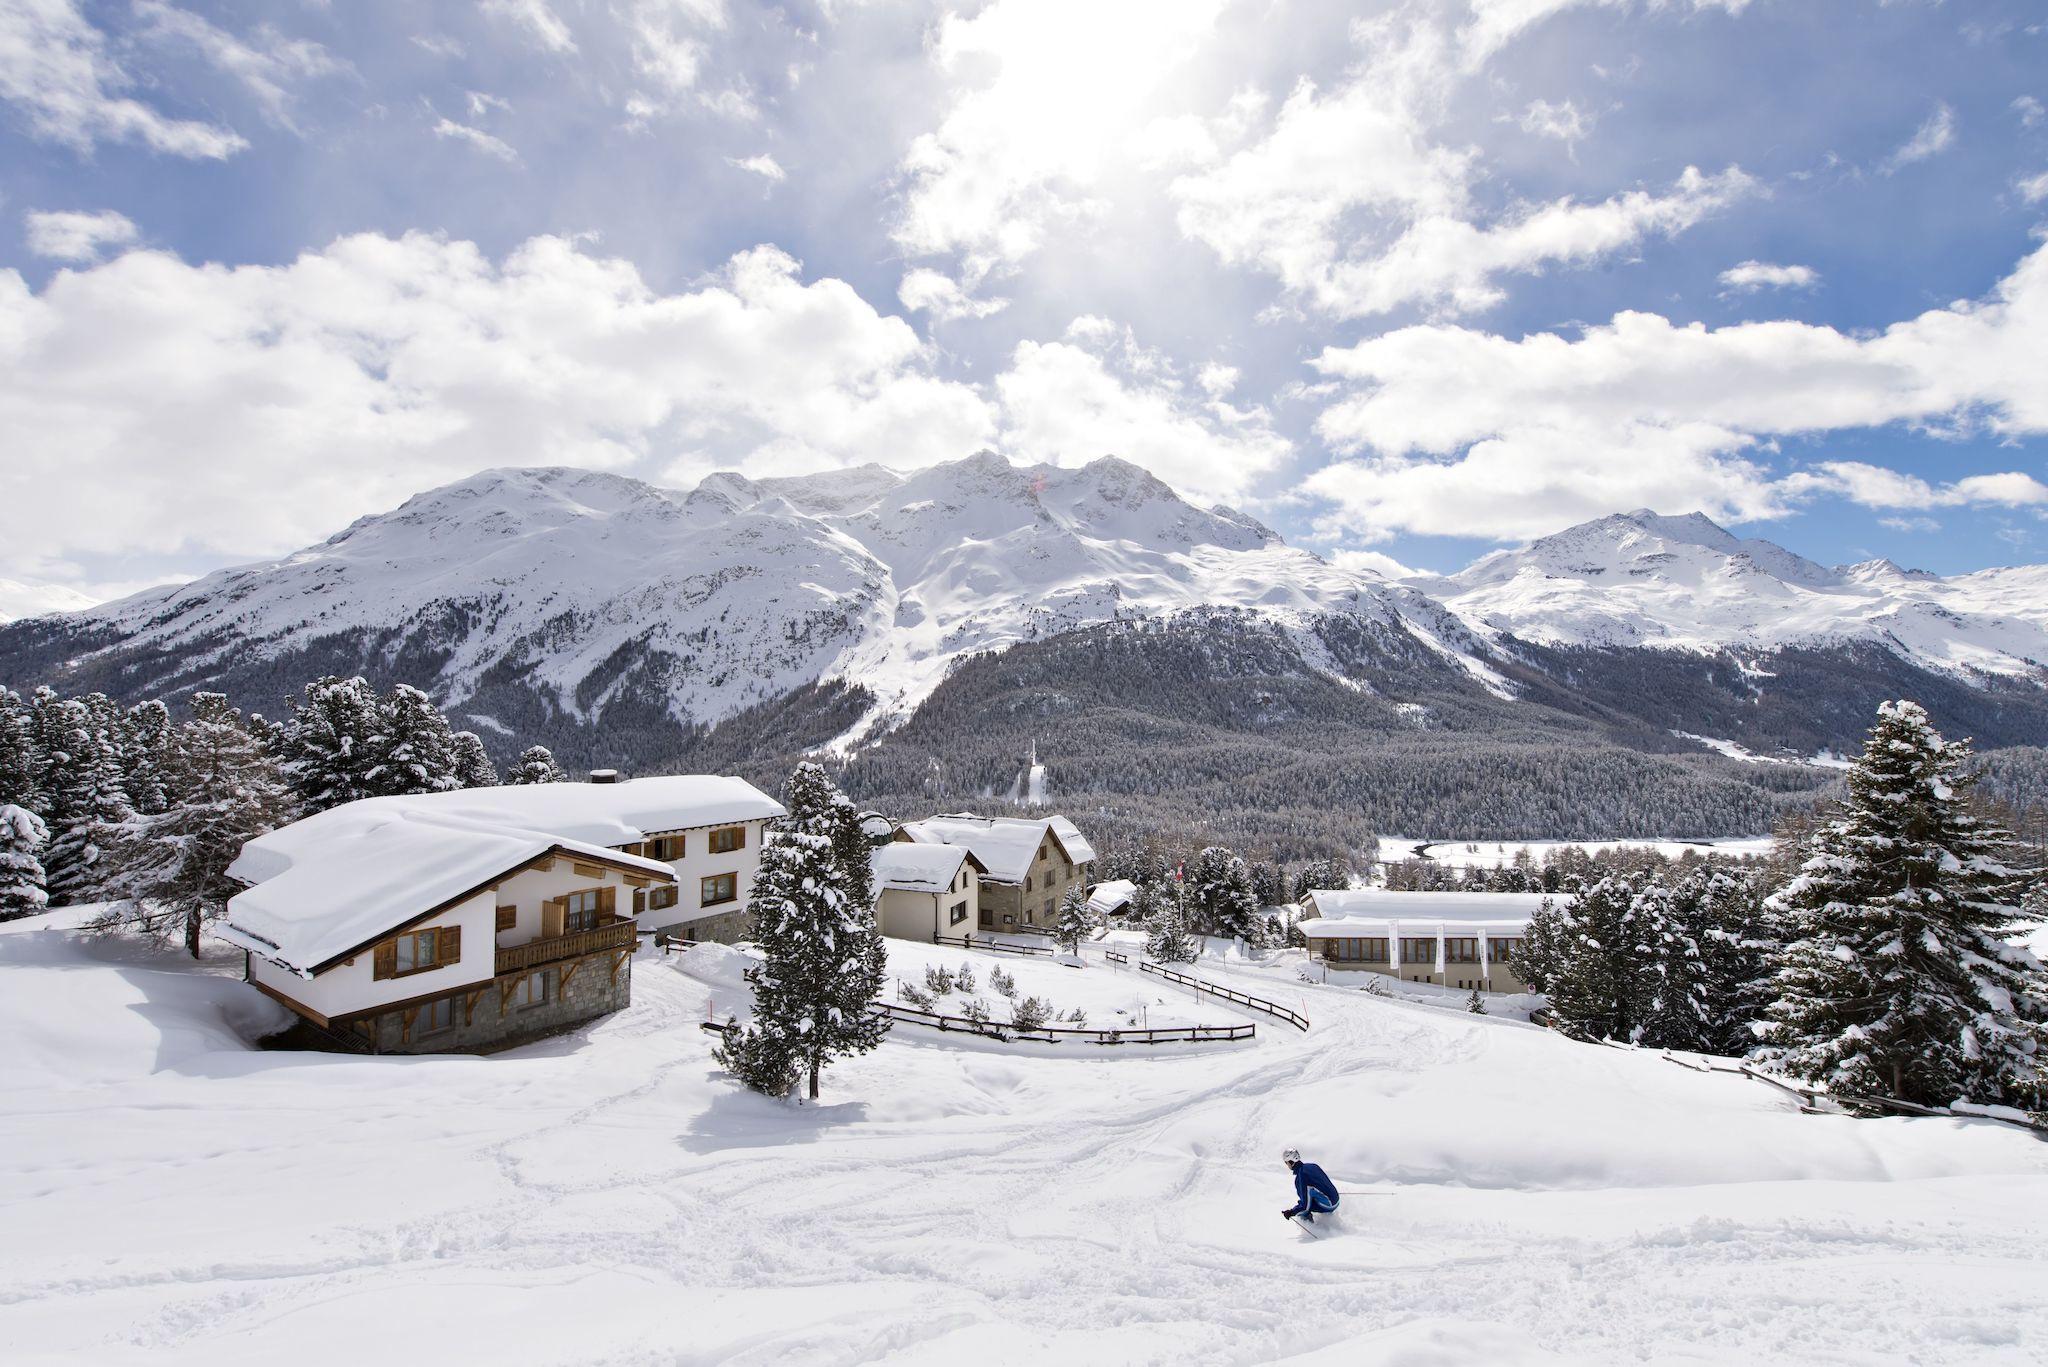 Randolins Familienresort, St Moritz, Engadin